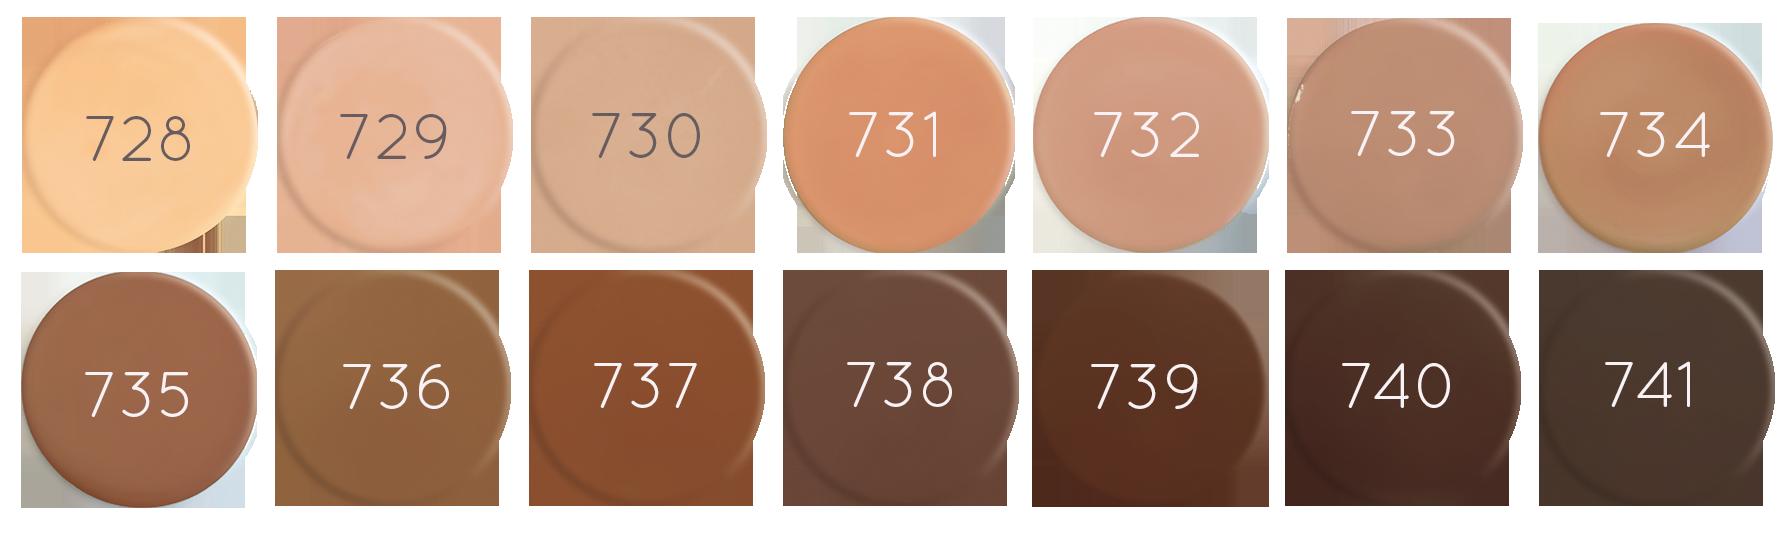 zao-make-up-teintes-fond-de-teint-compact.png